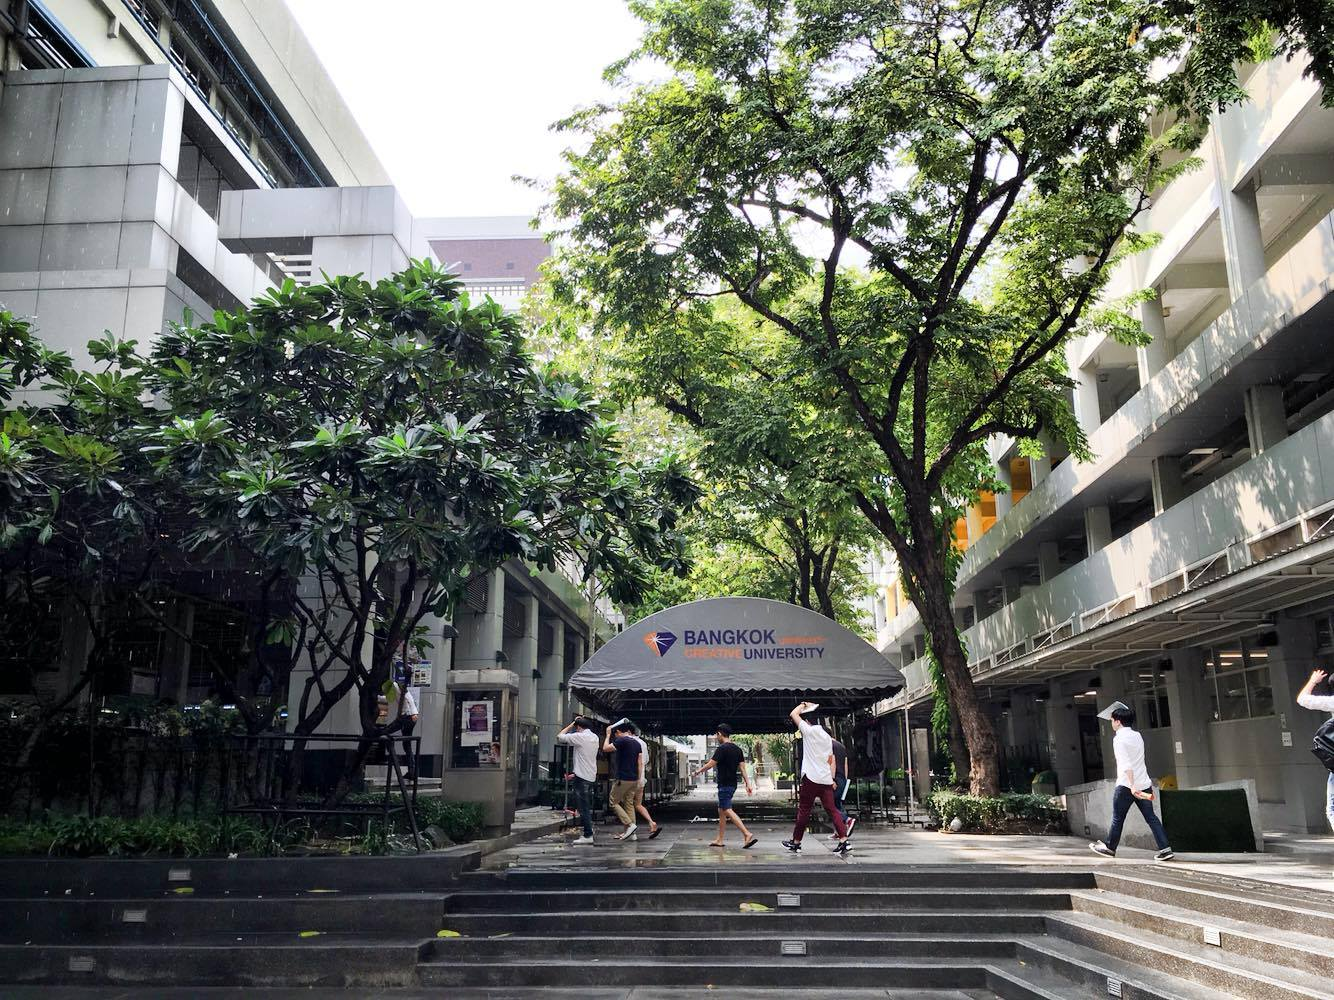 Bangkok university campas